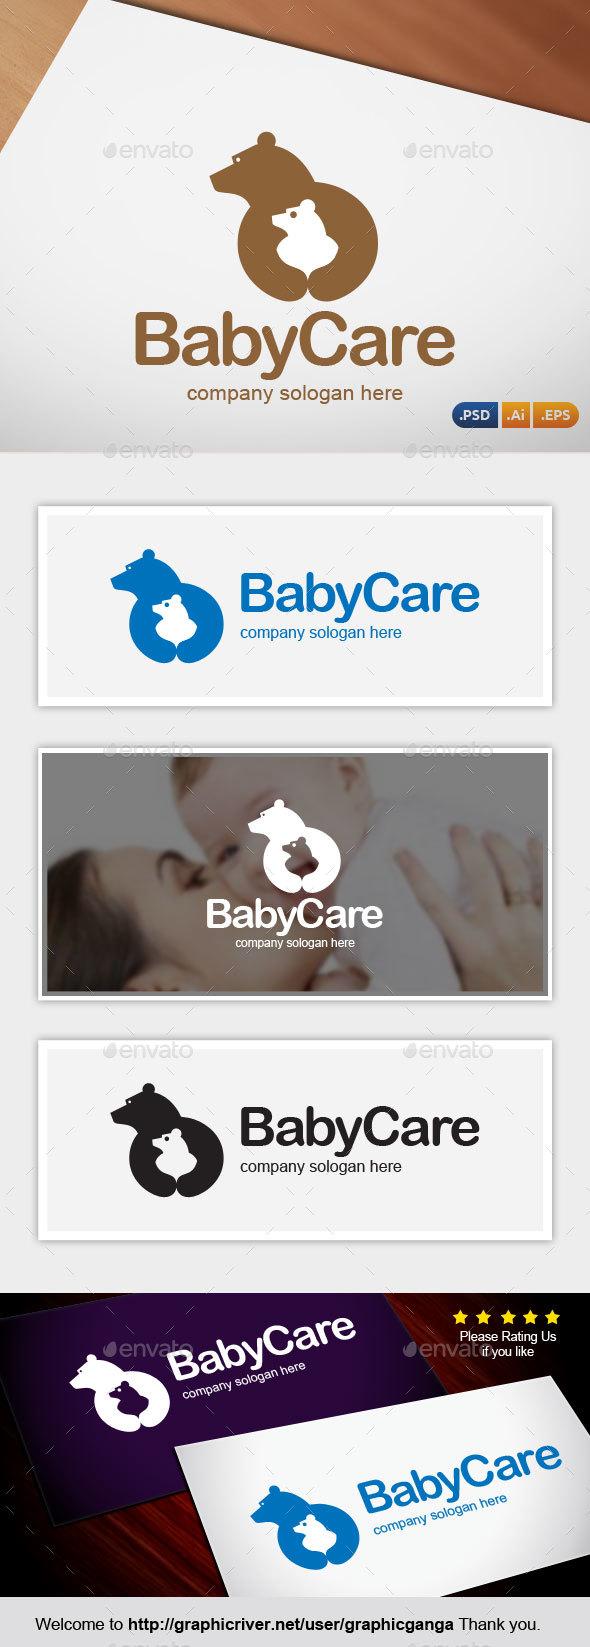 BabyCare - Abstract Logo Templates